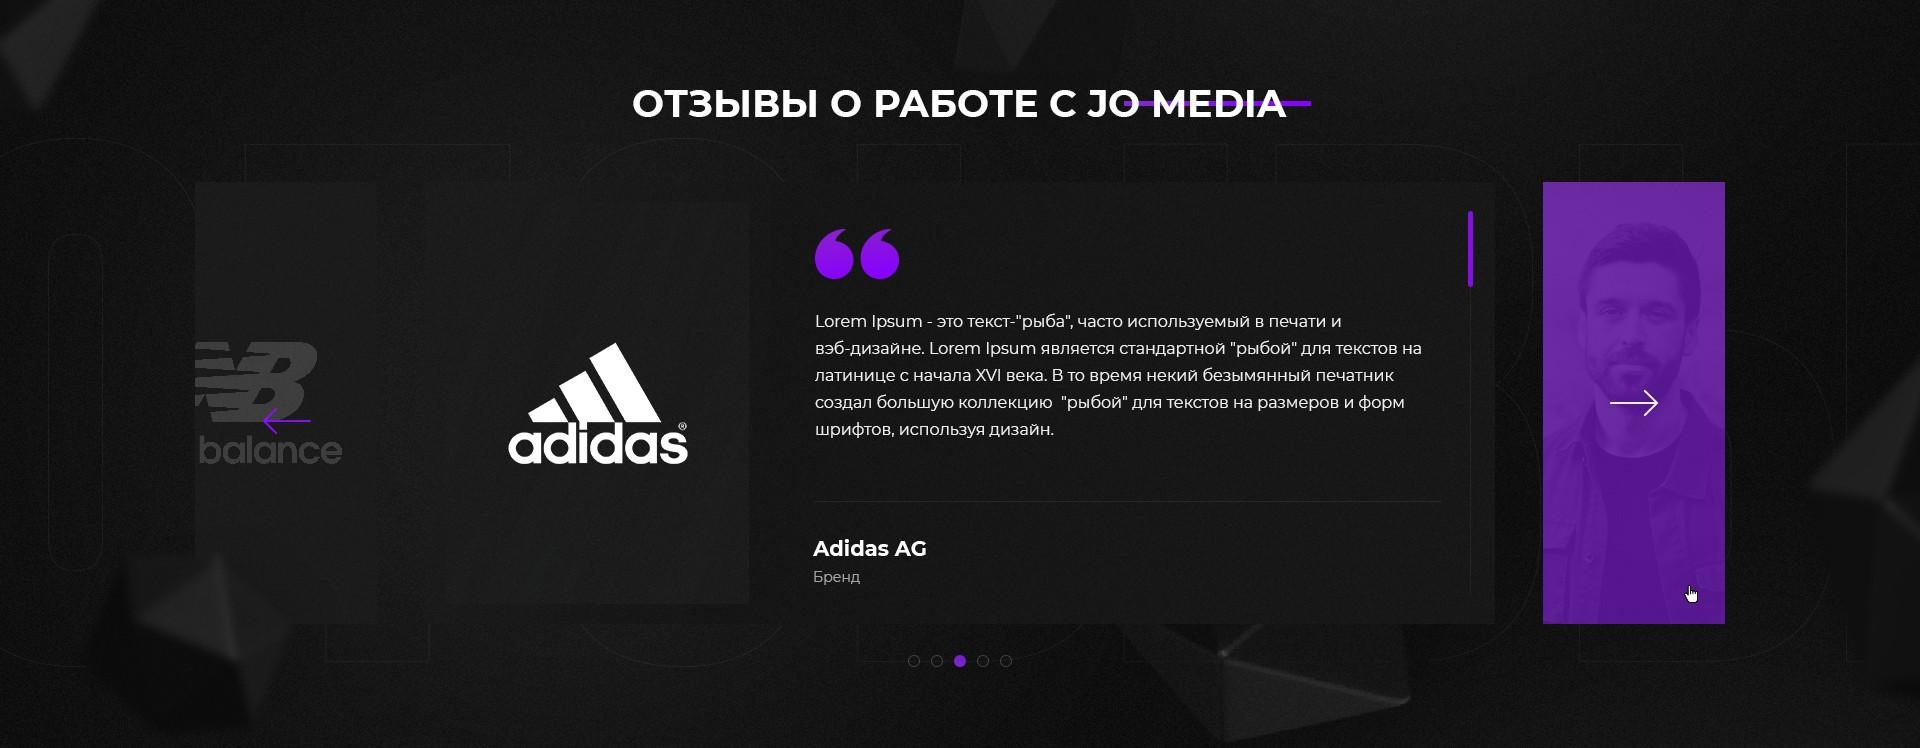 LP_JОMedia_01_Home_Page(brands)_2.1